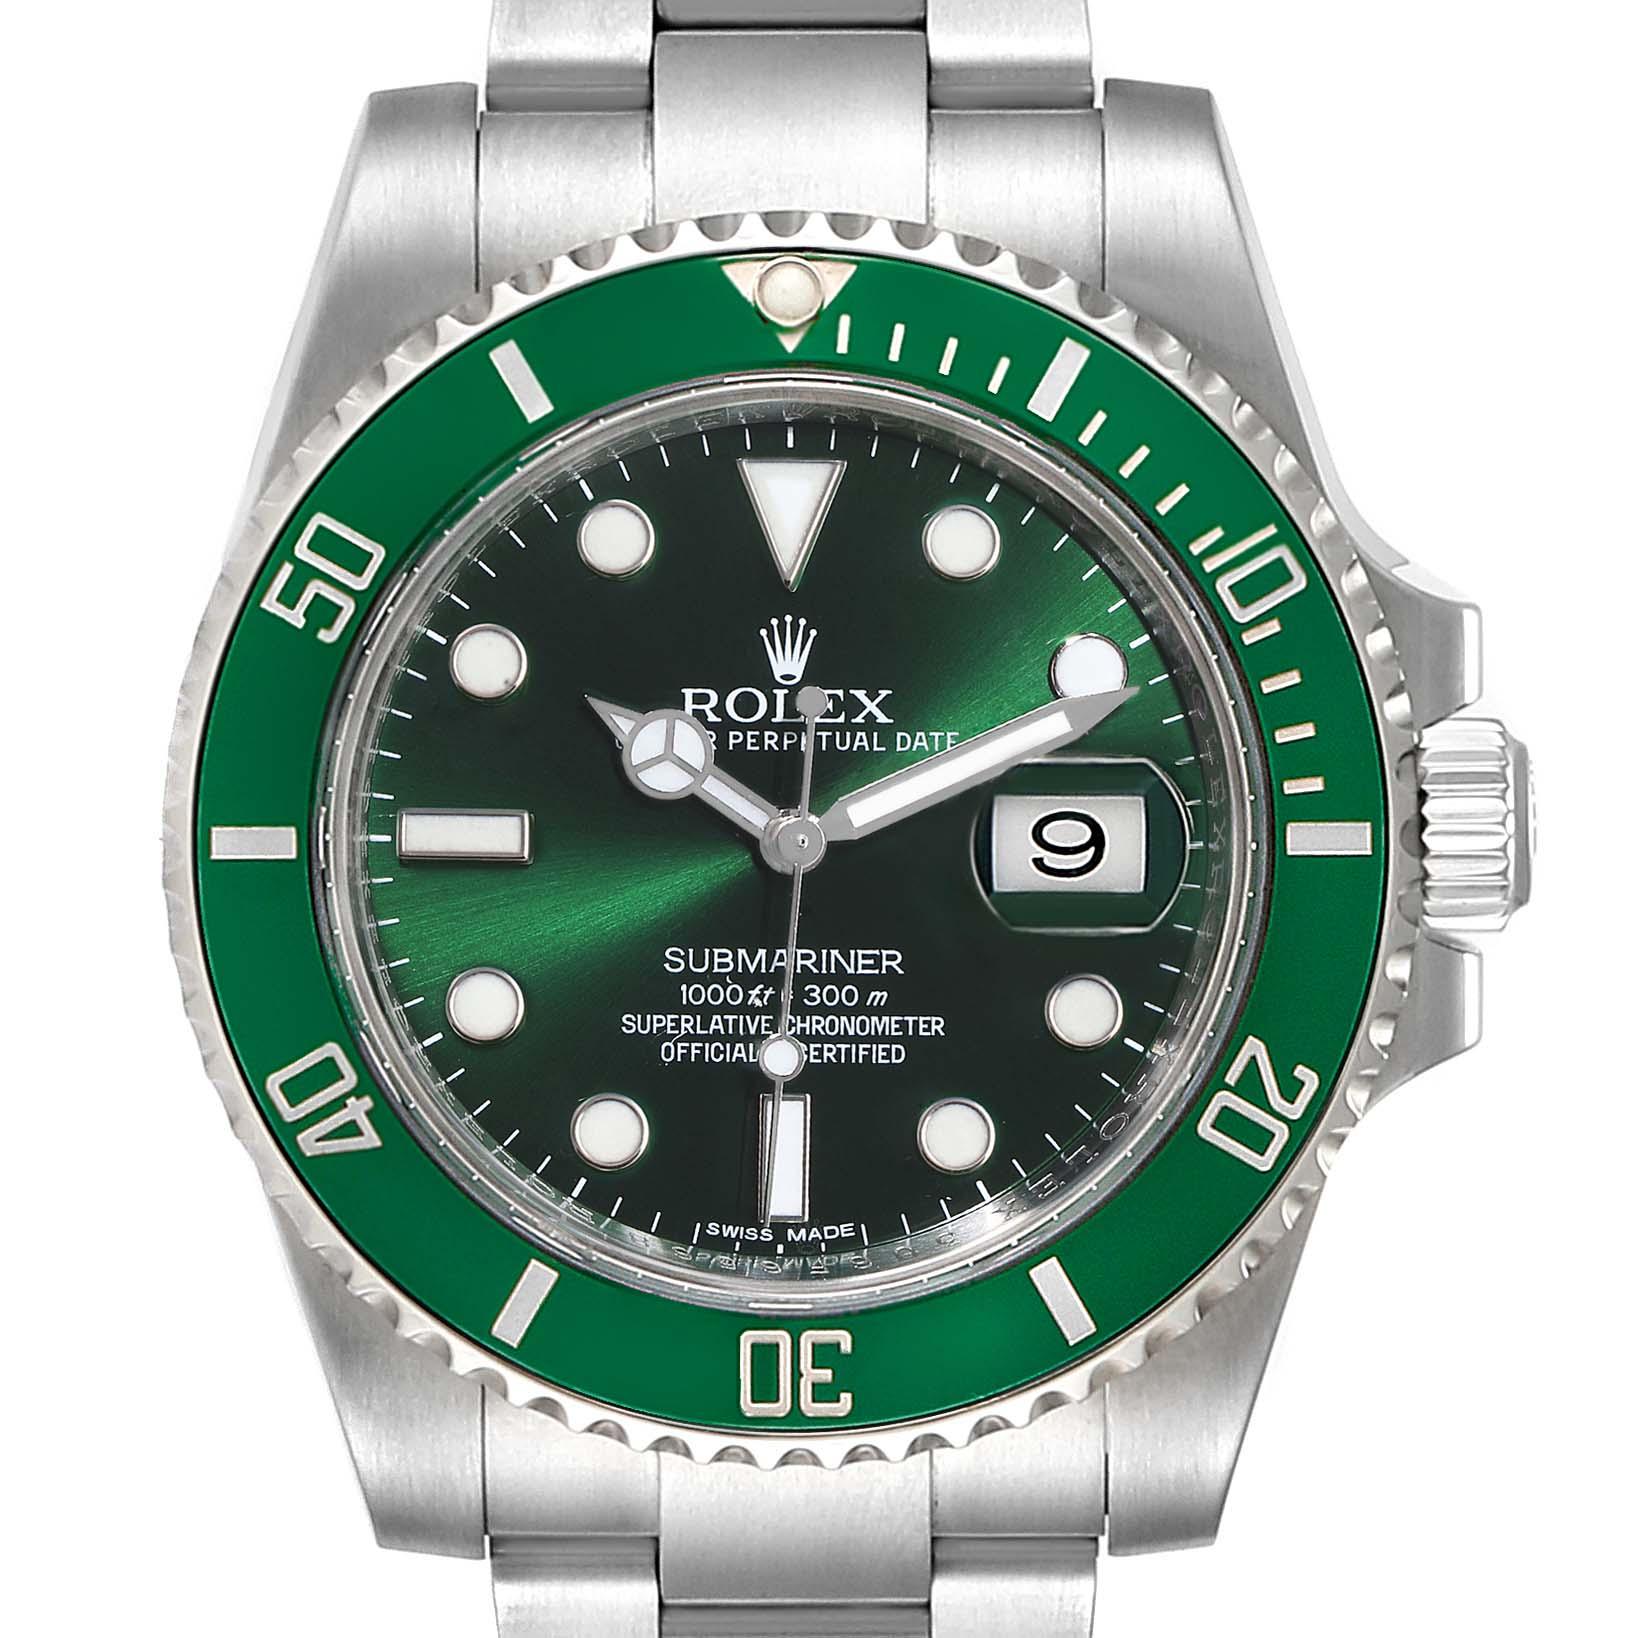 Rolex Submariner Hulk Green Dial Bezel Mens Watch 116610LV Box Card